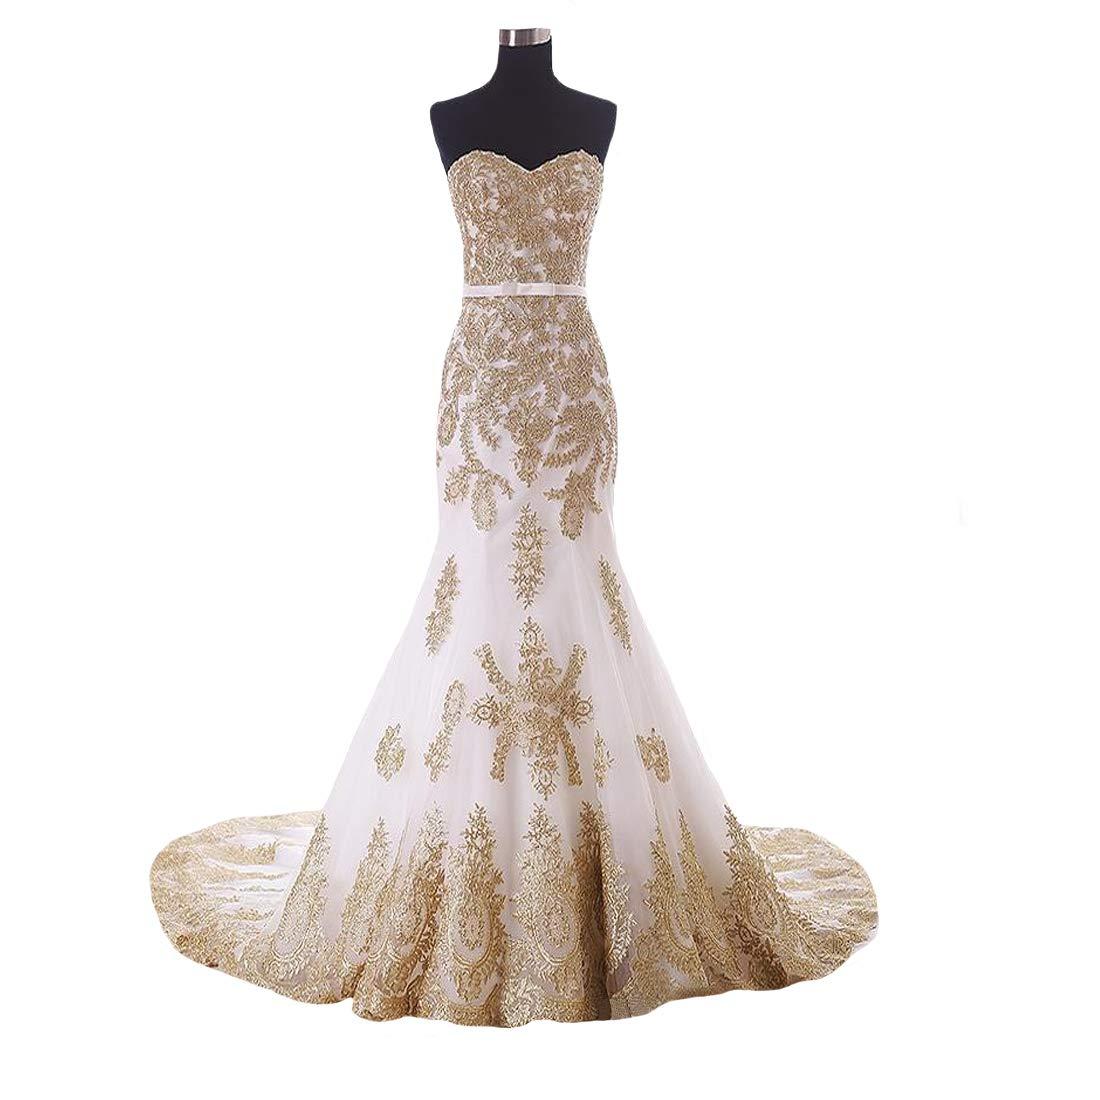 Dingdingmail Sexy Sweetheart Mermaid Wedding Dress 2019 Gold Lace